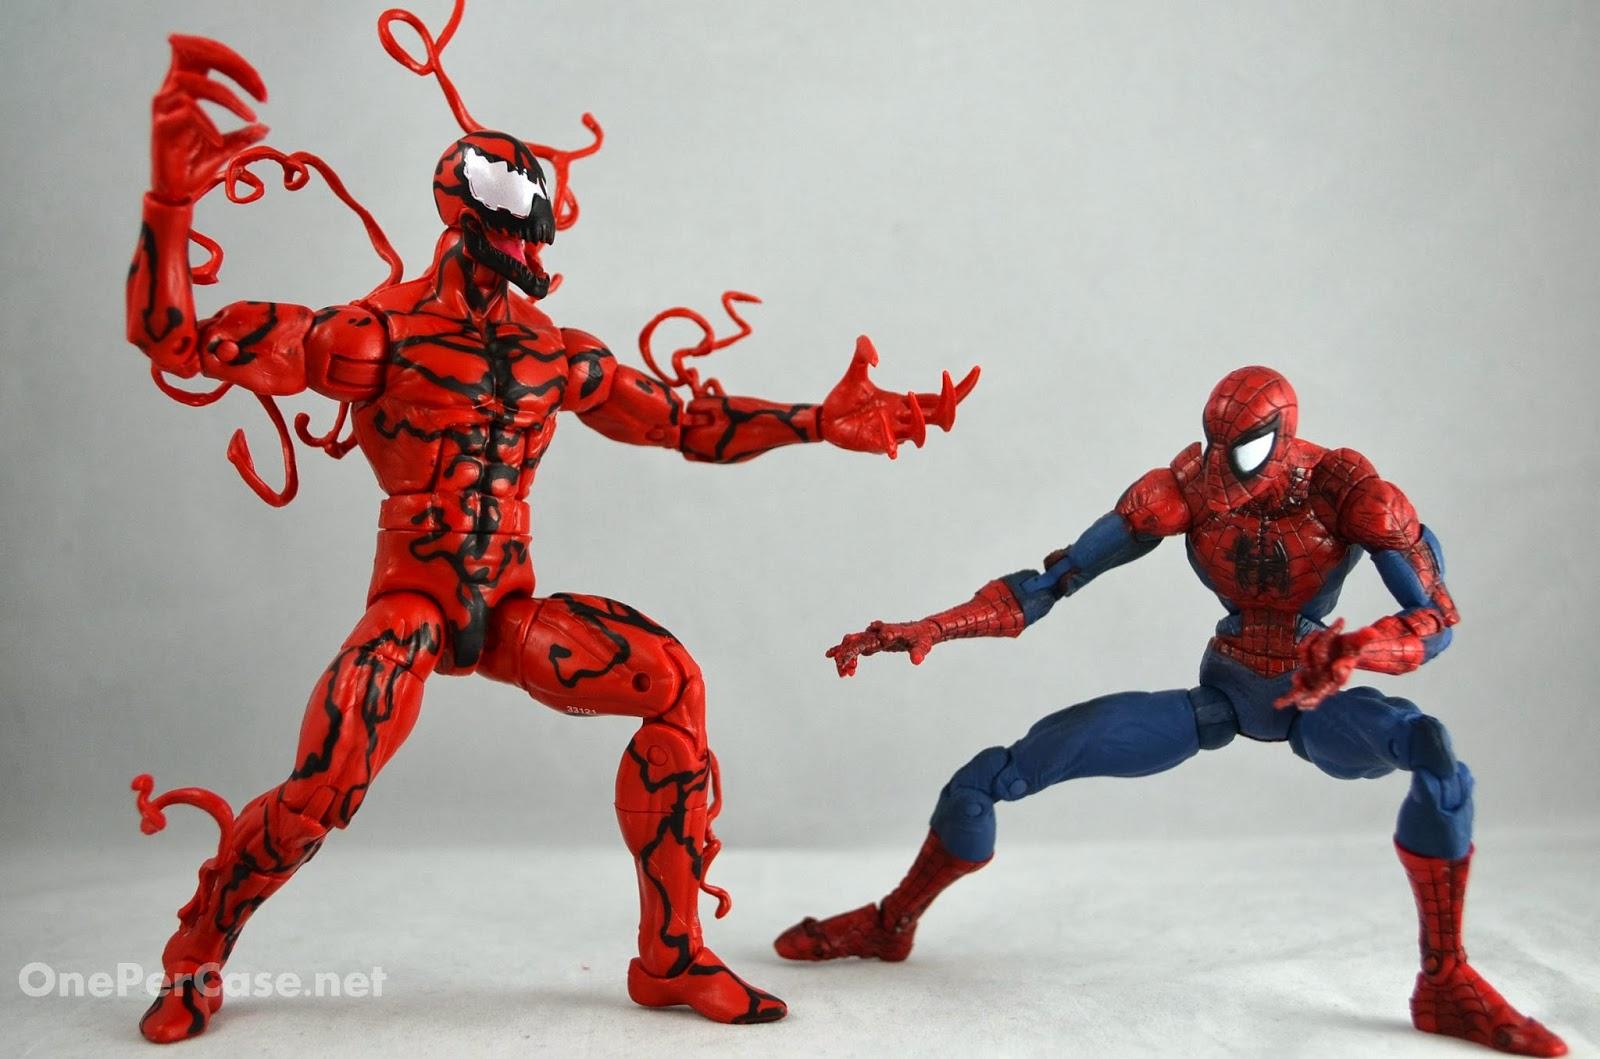 carnage marvel comics spawn - photo #34